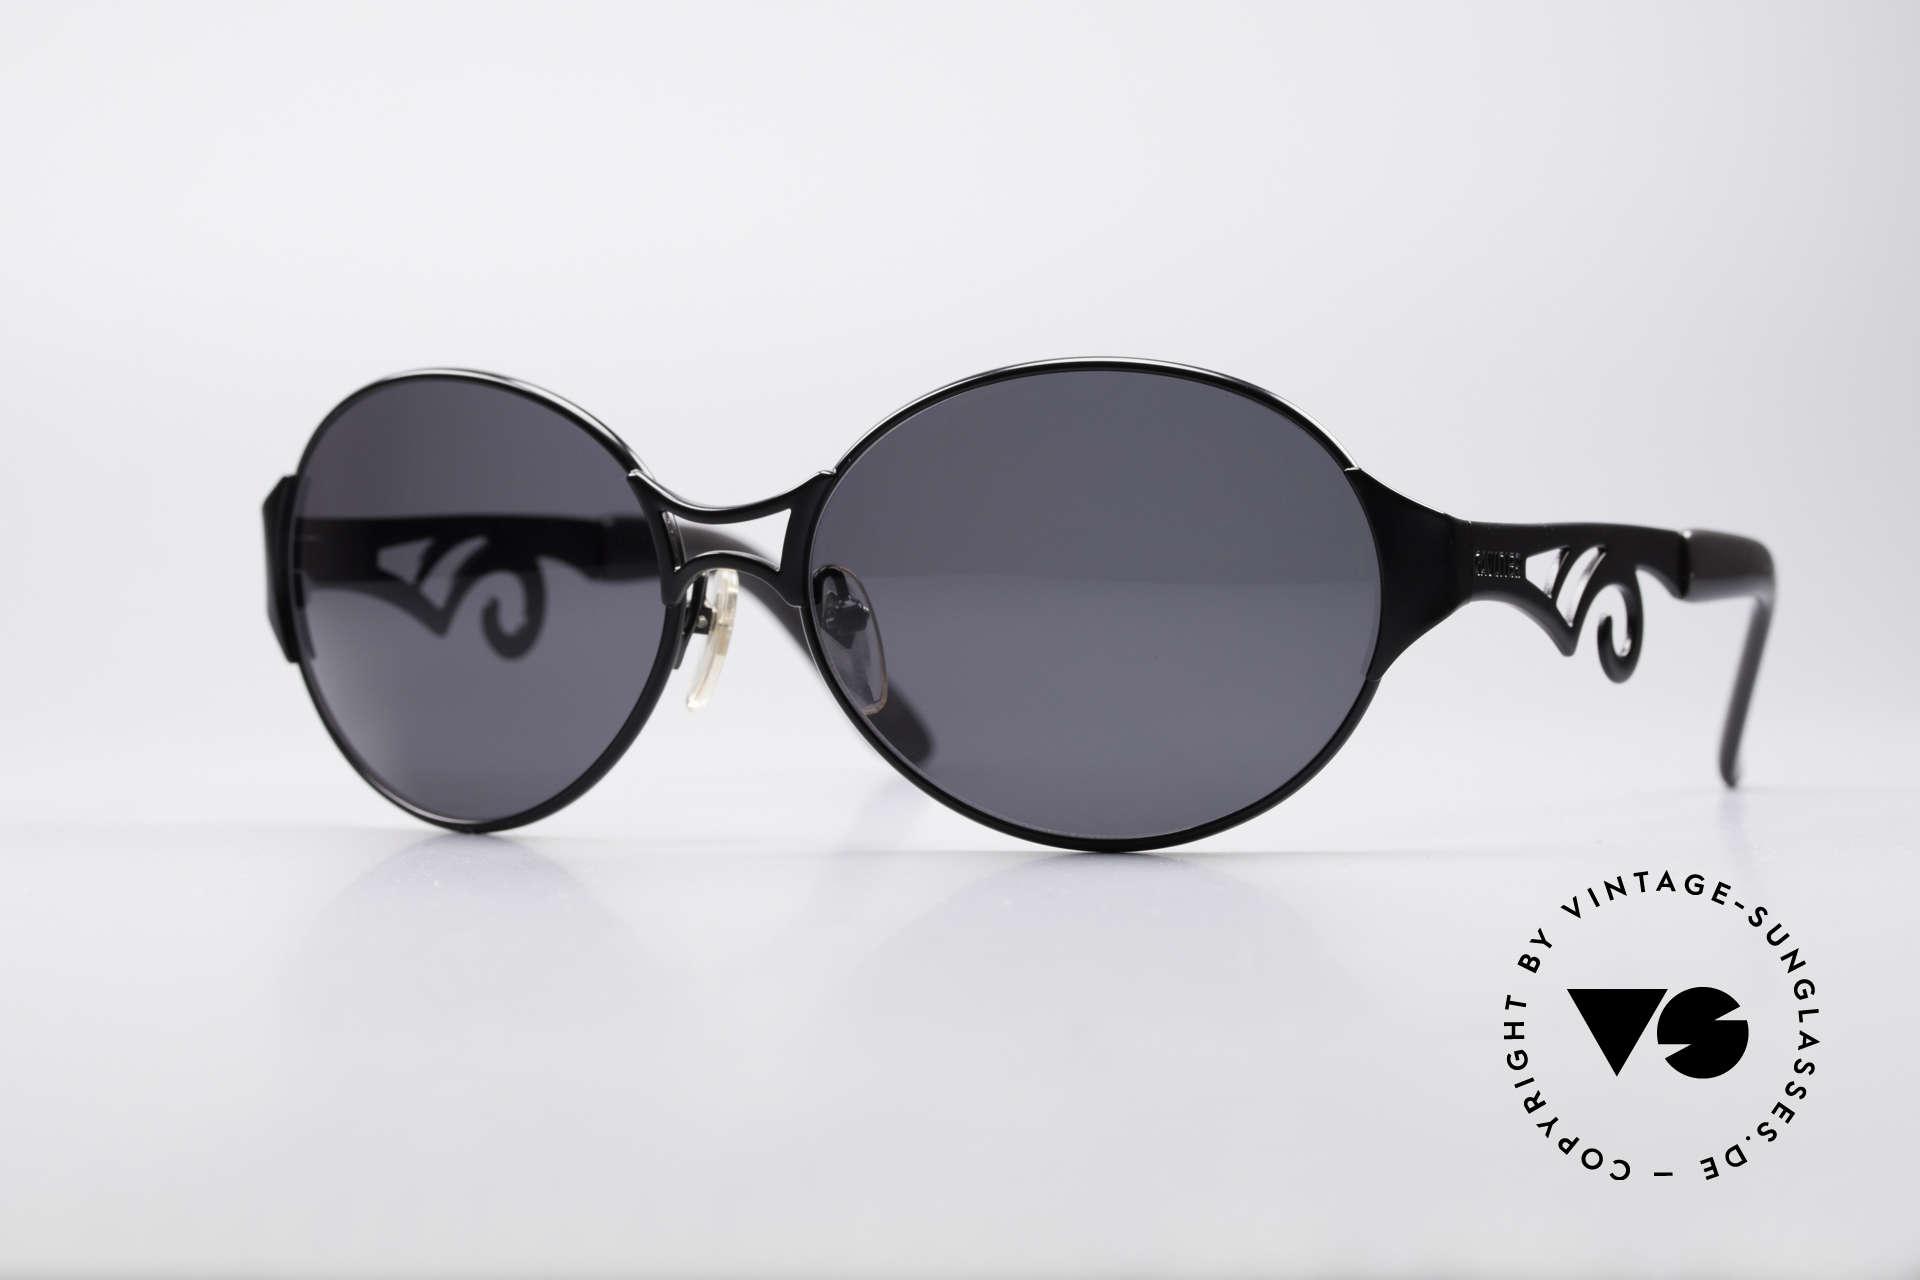 Jean Paul Gaultier 56-6108 90's Ladies Sunglasses, glamorous ladies sunglasses by JP Gaultier, Made for Women